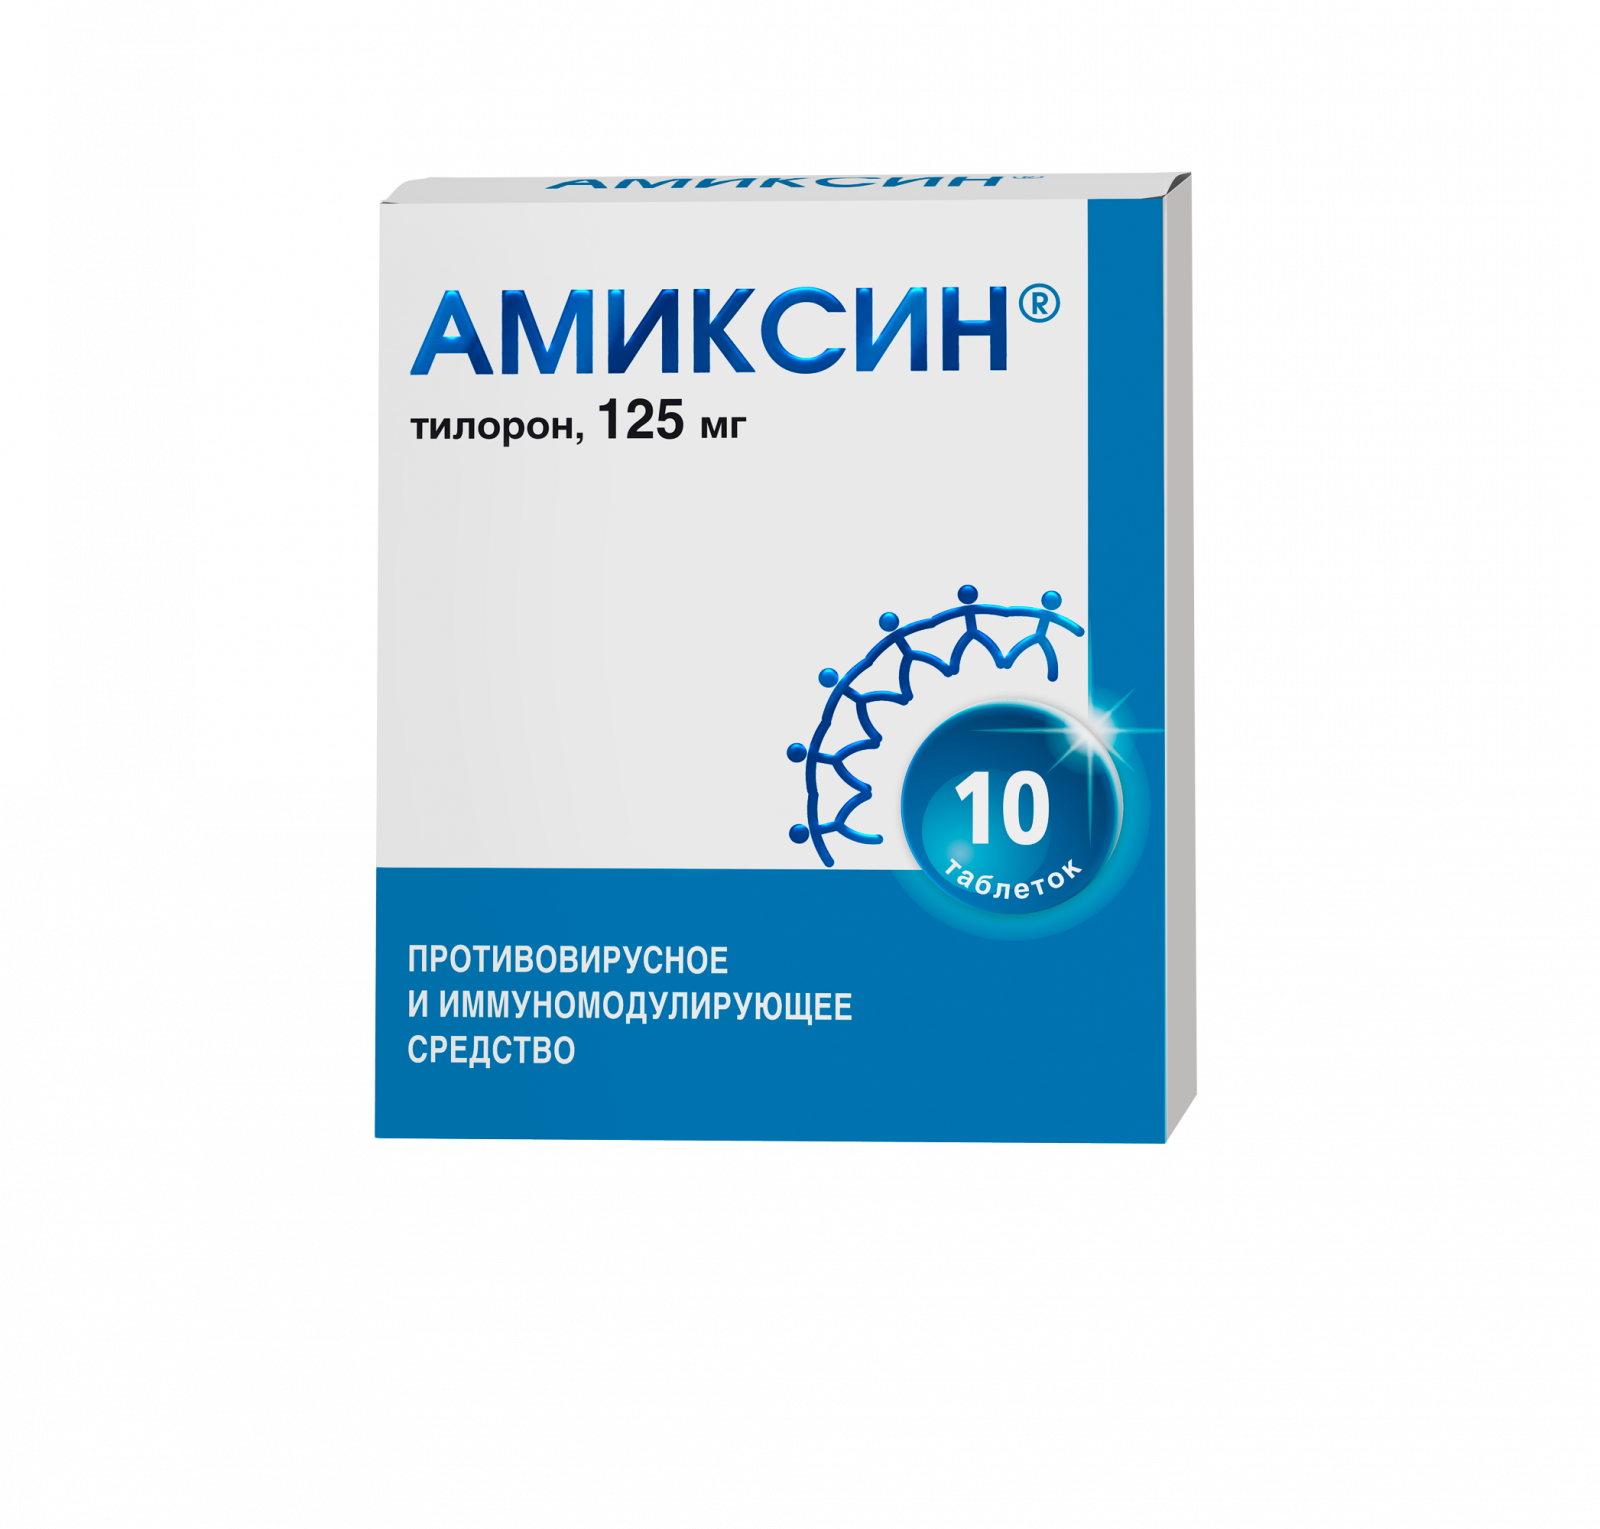 Фото препарата Амиксин таблетки покрытые оболочкой 125 мг блистер